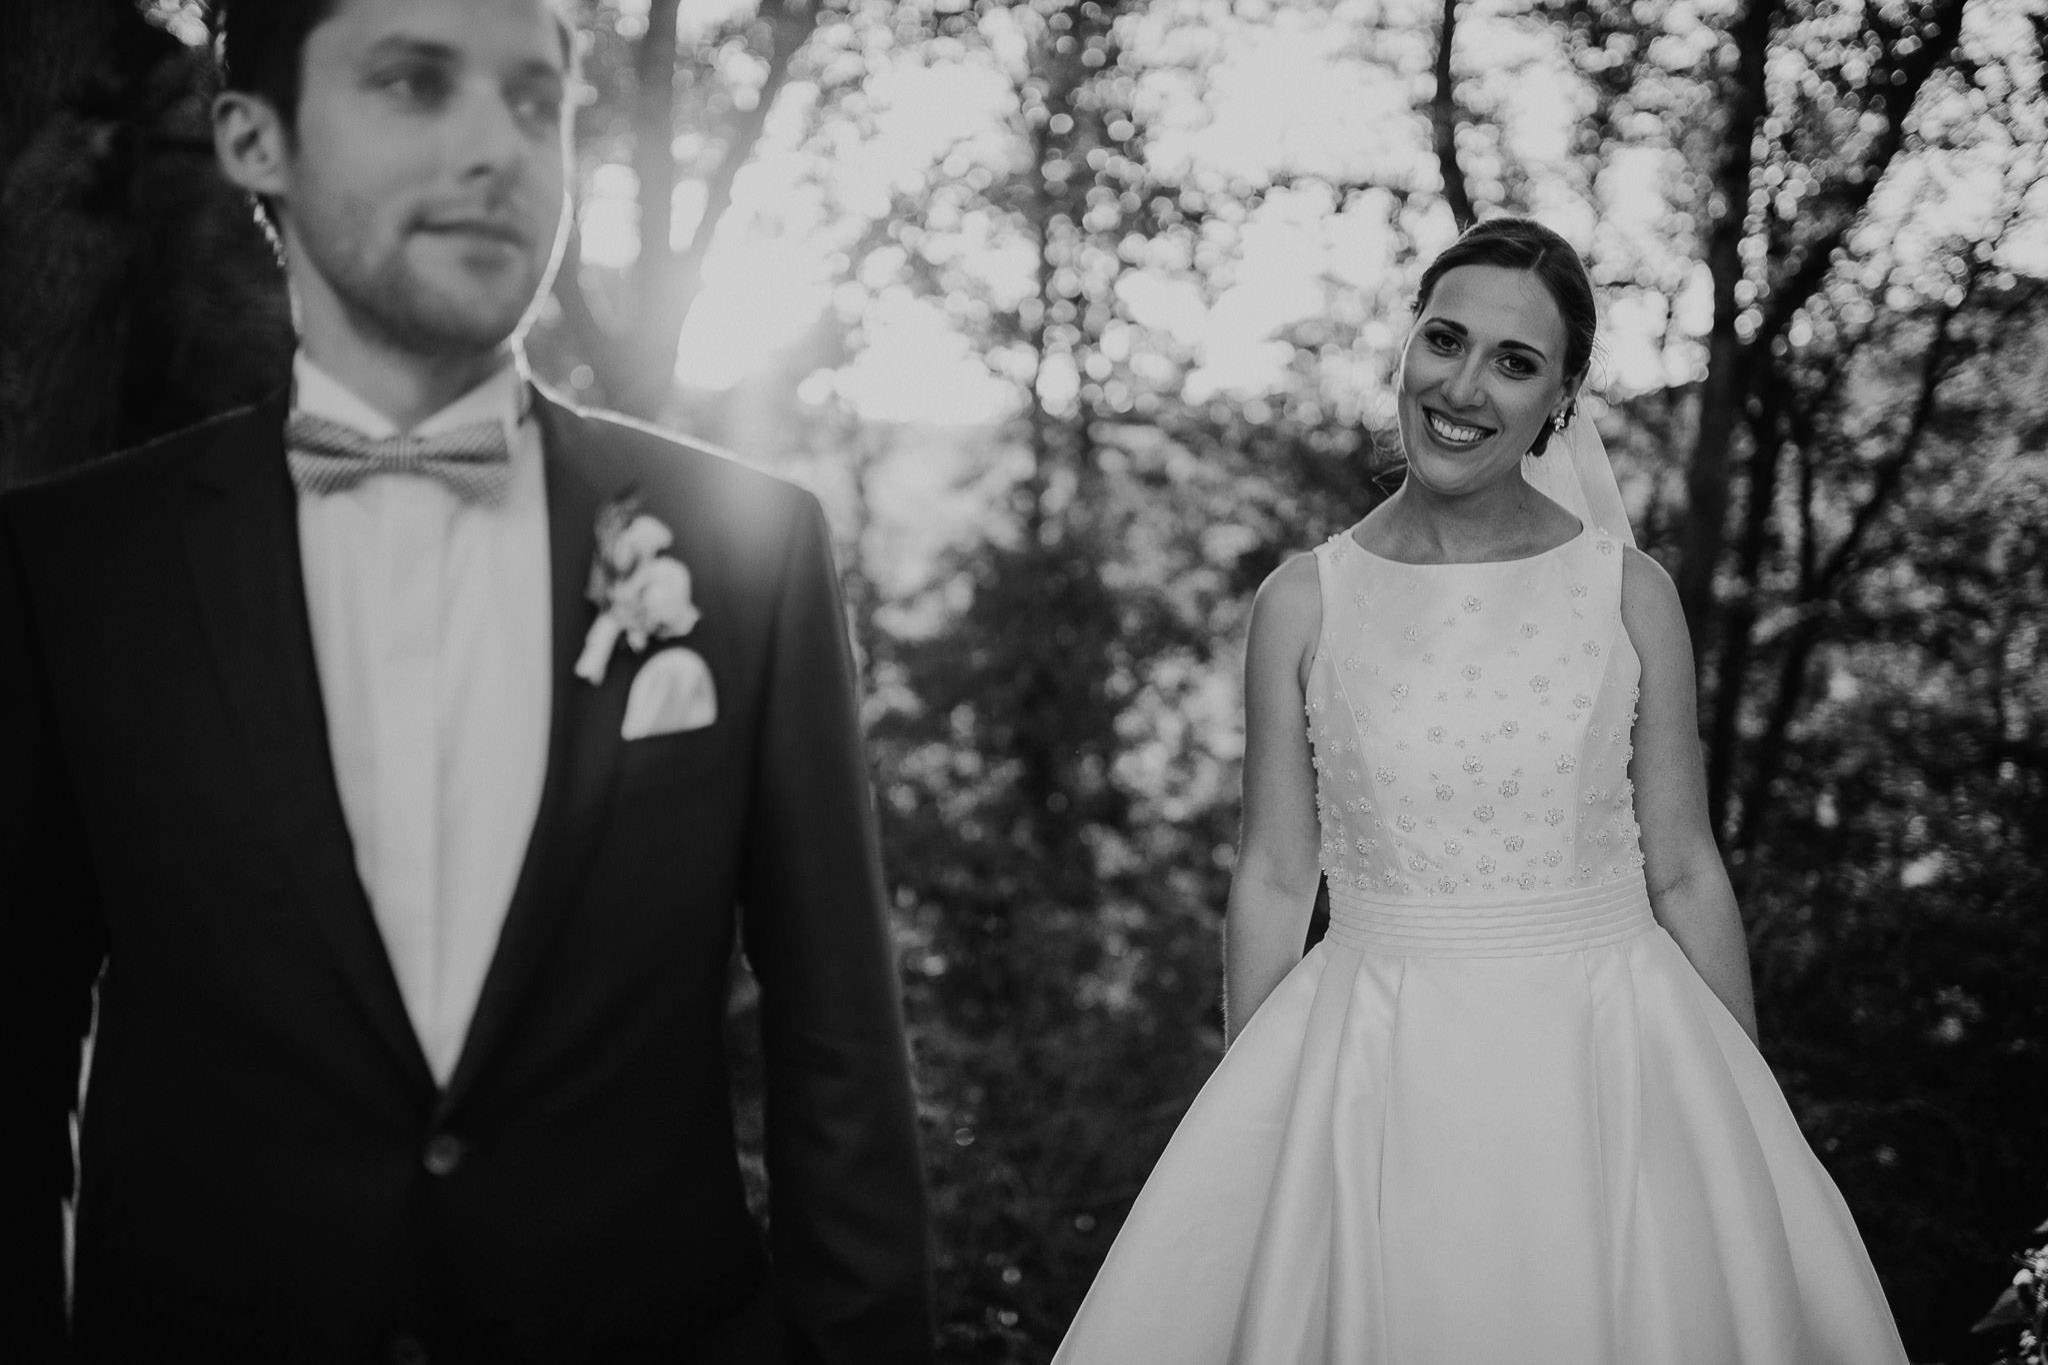 wedding photographer hamilton new zealand 1065 2